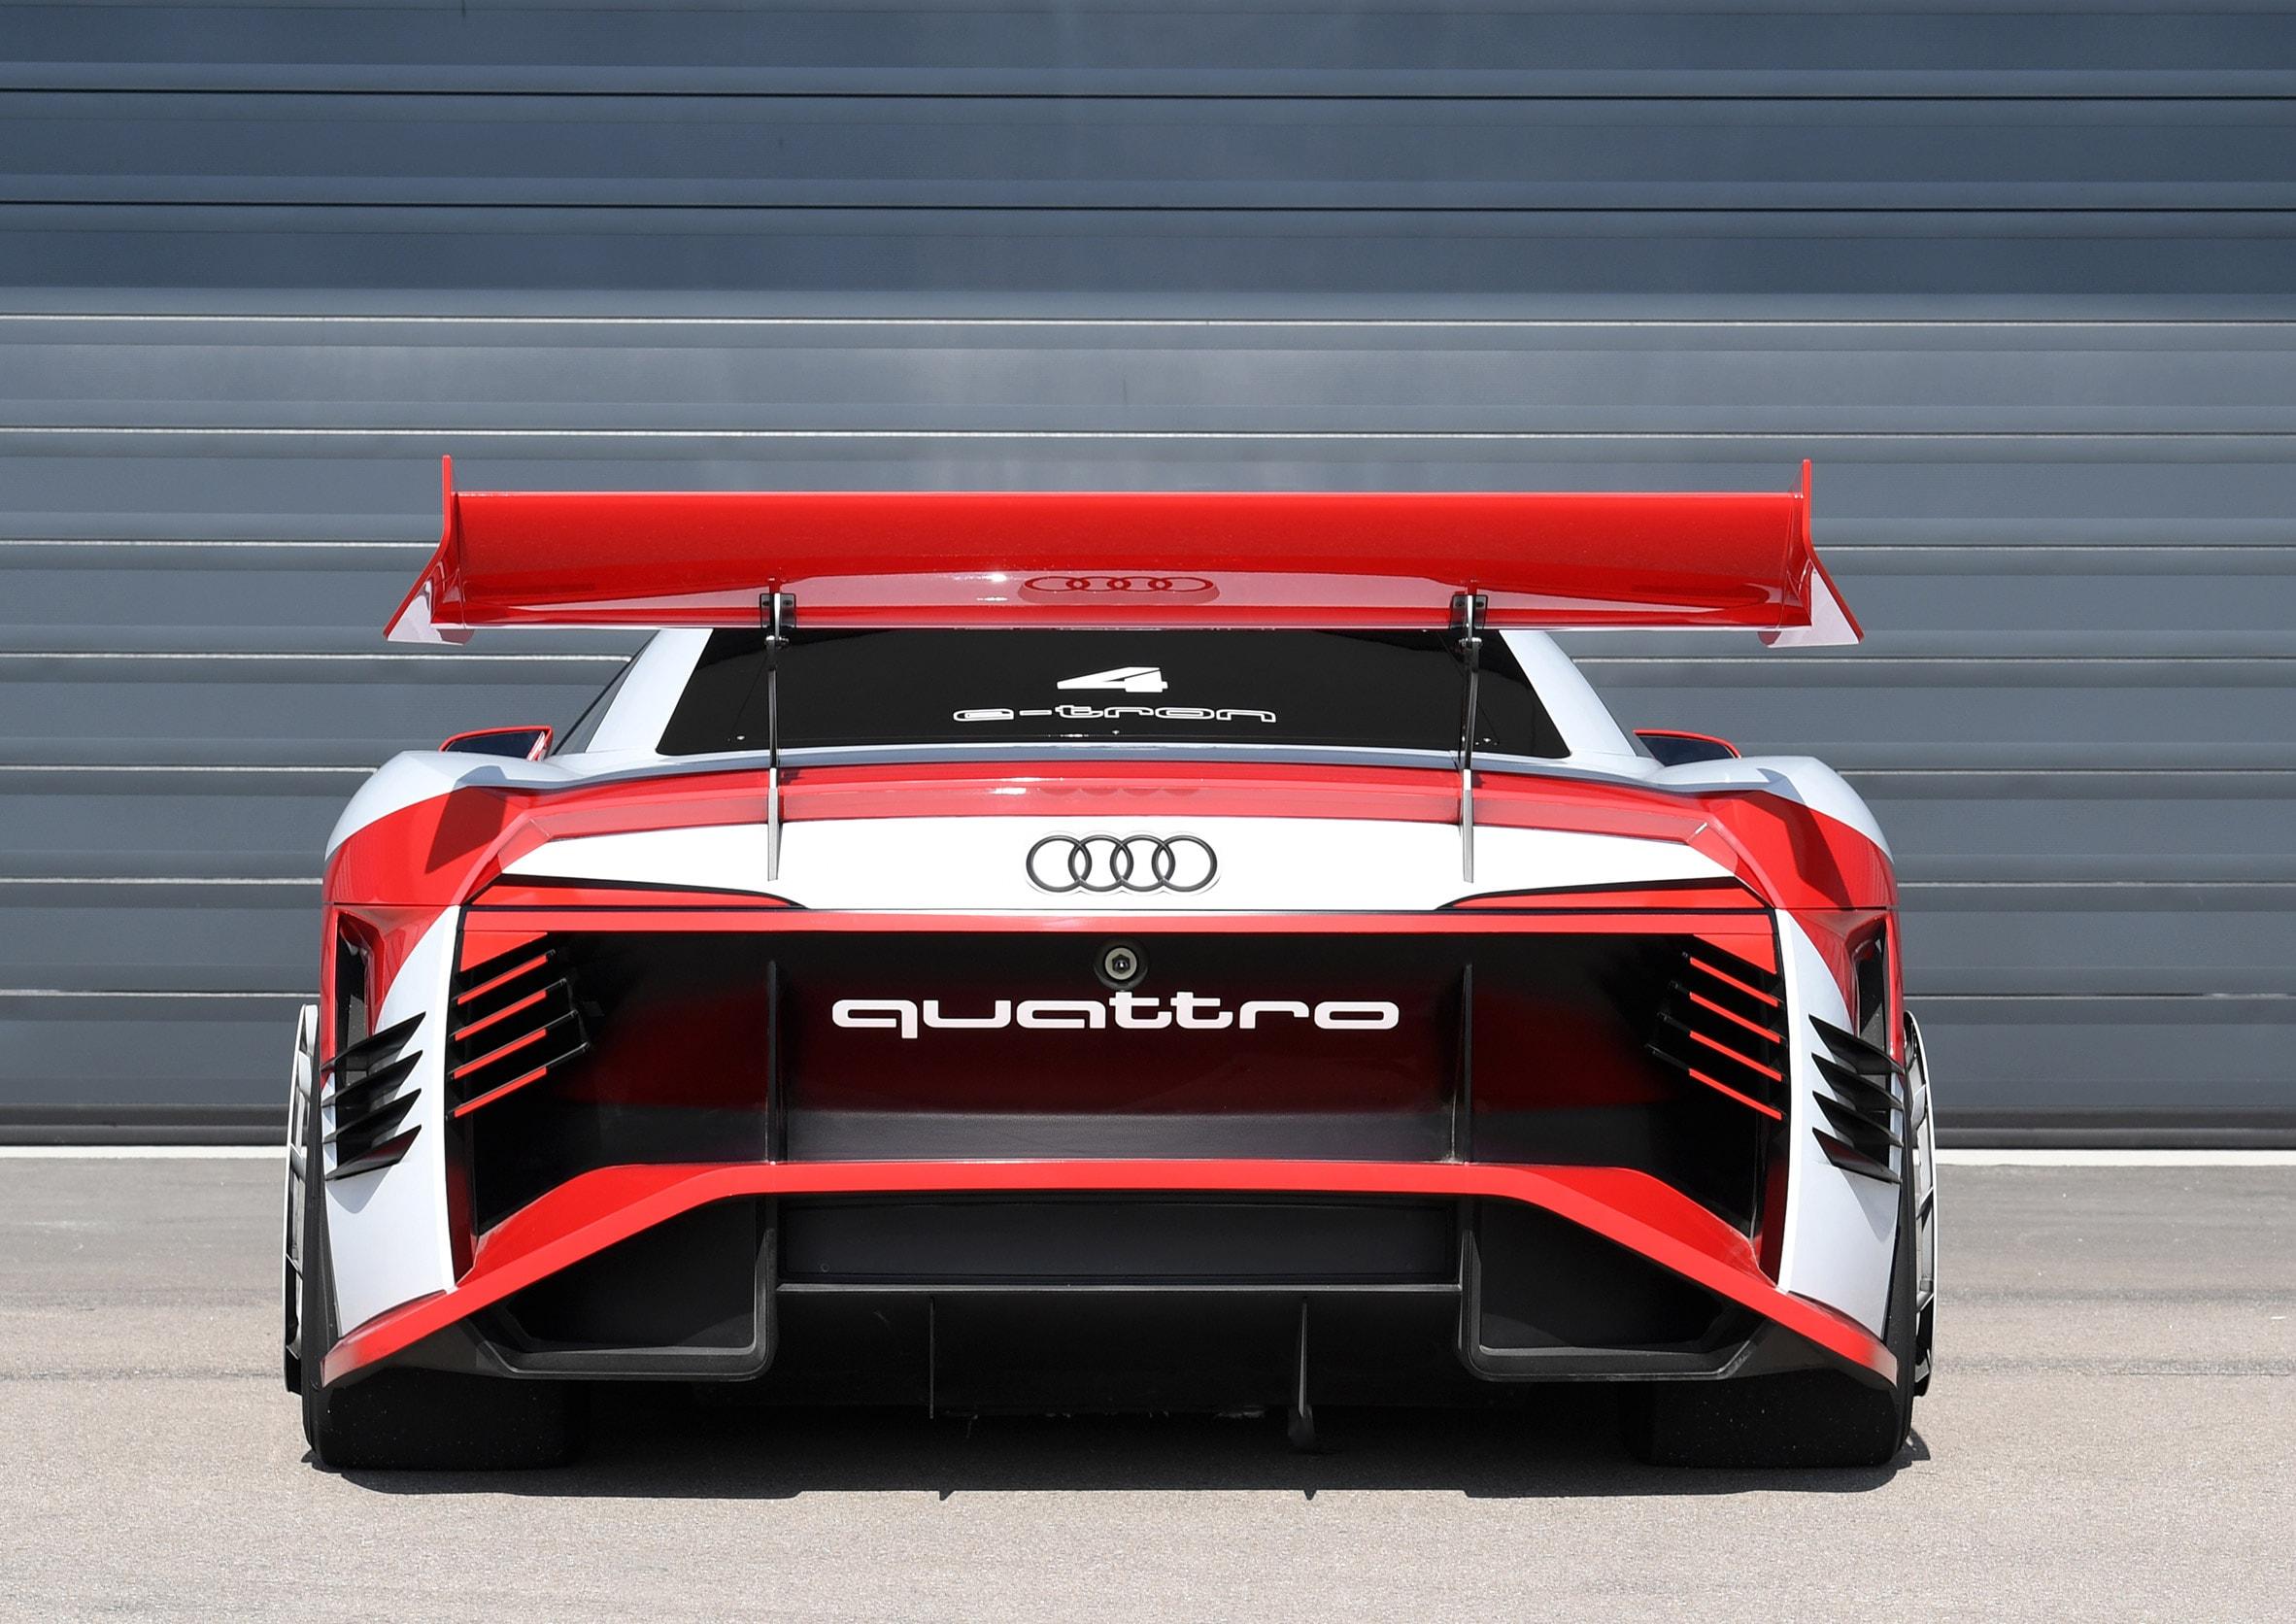 Audi e-tron Vision GT: Aπό τις ψηφιακές πίστες του Gran Turismo στις πίστες της Formula E